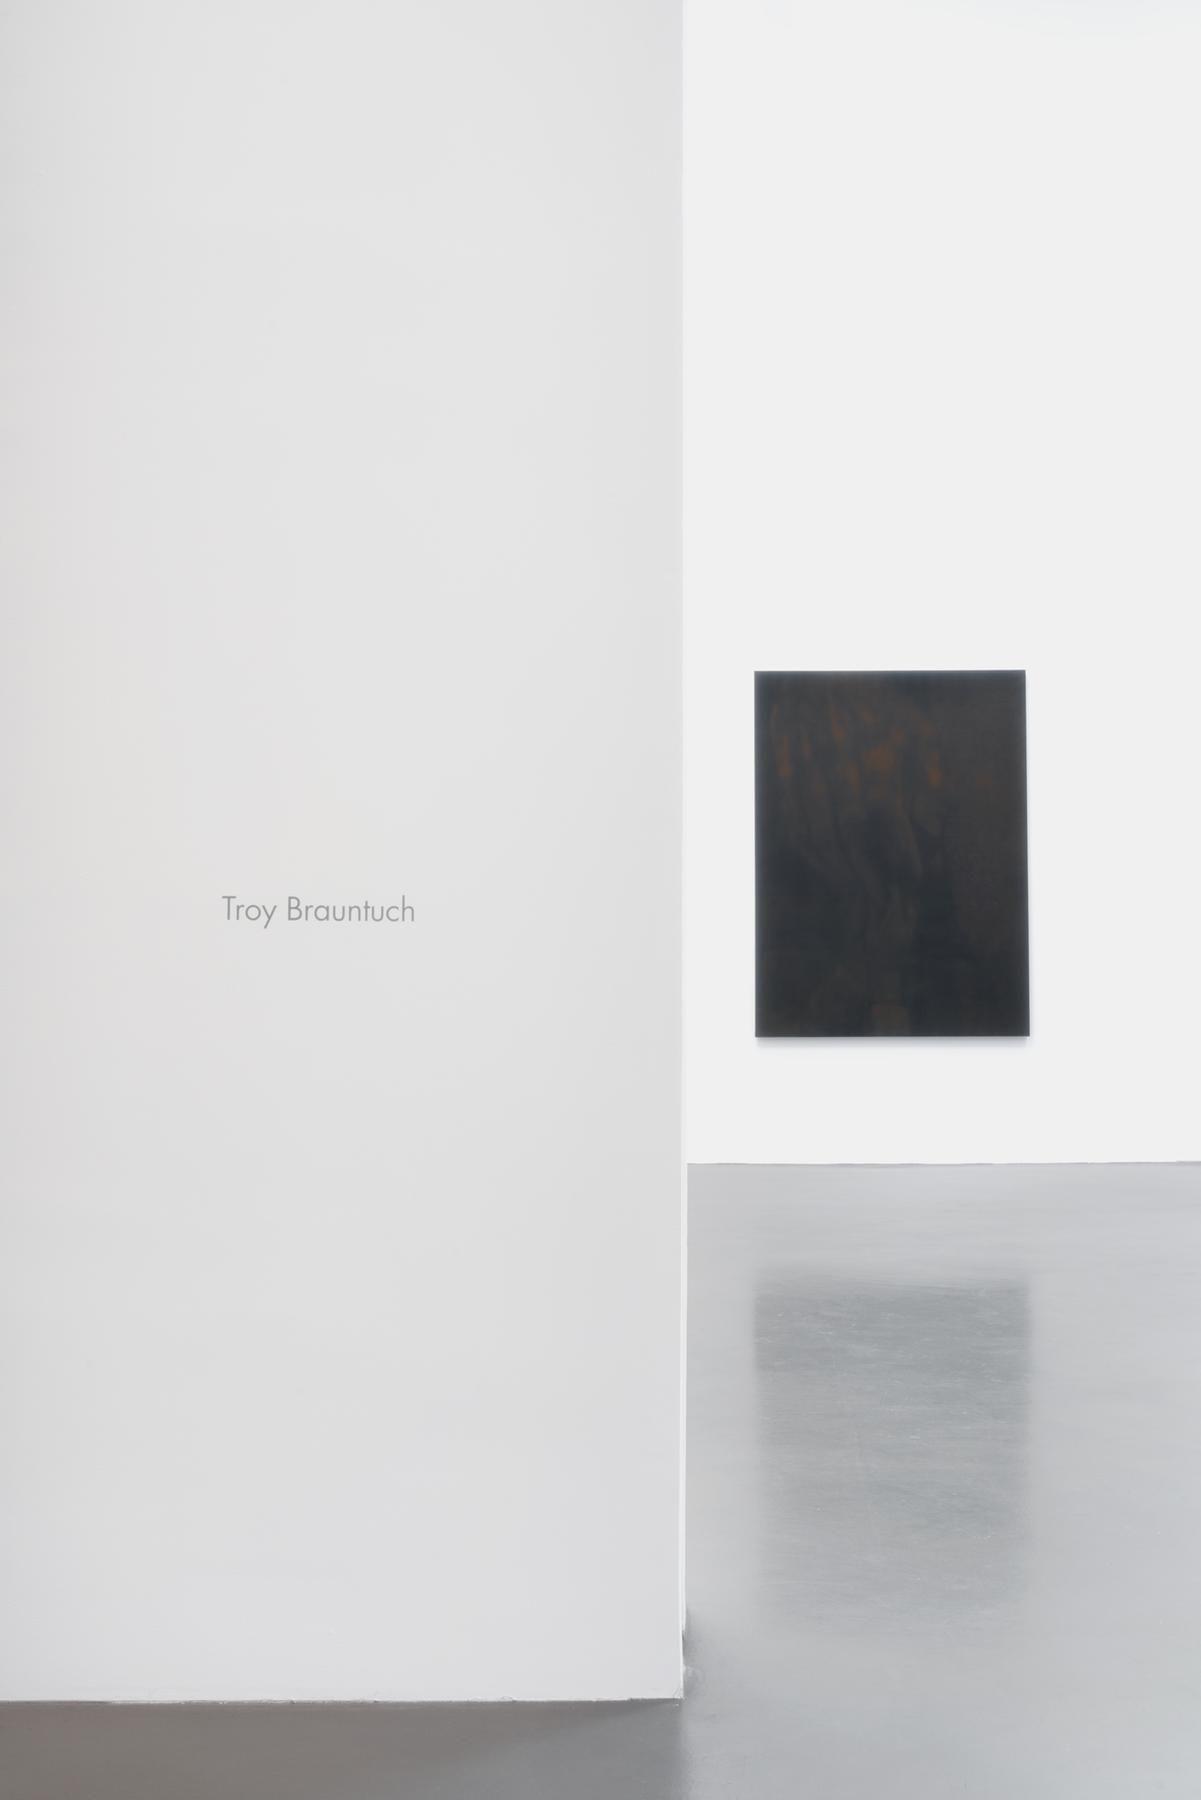 Troy Brauntuch Installation view 1